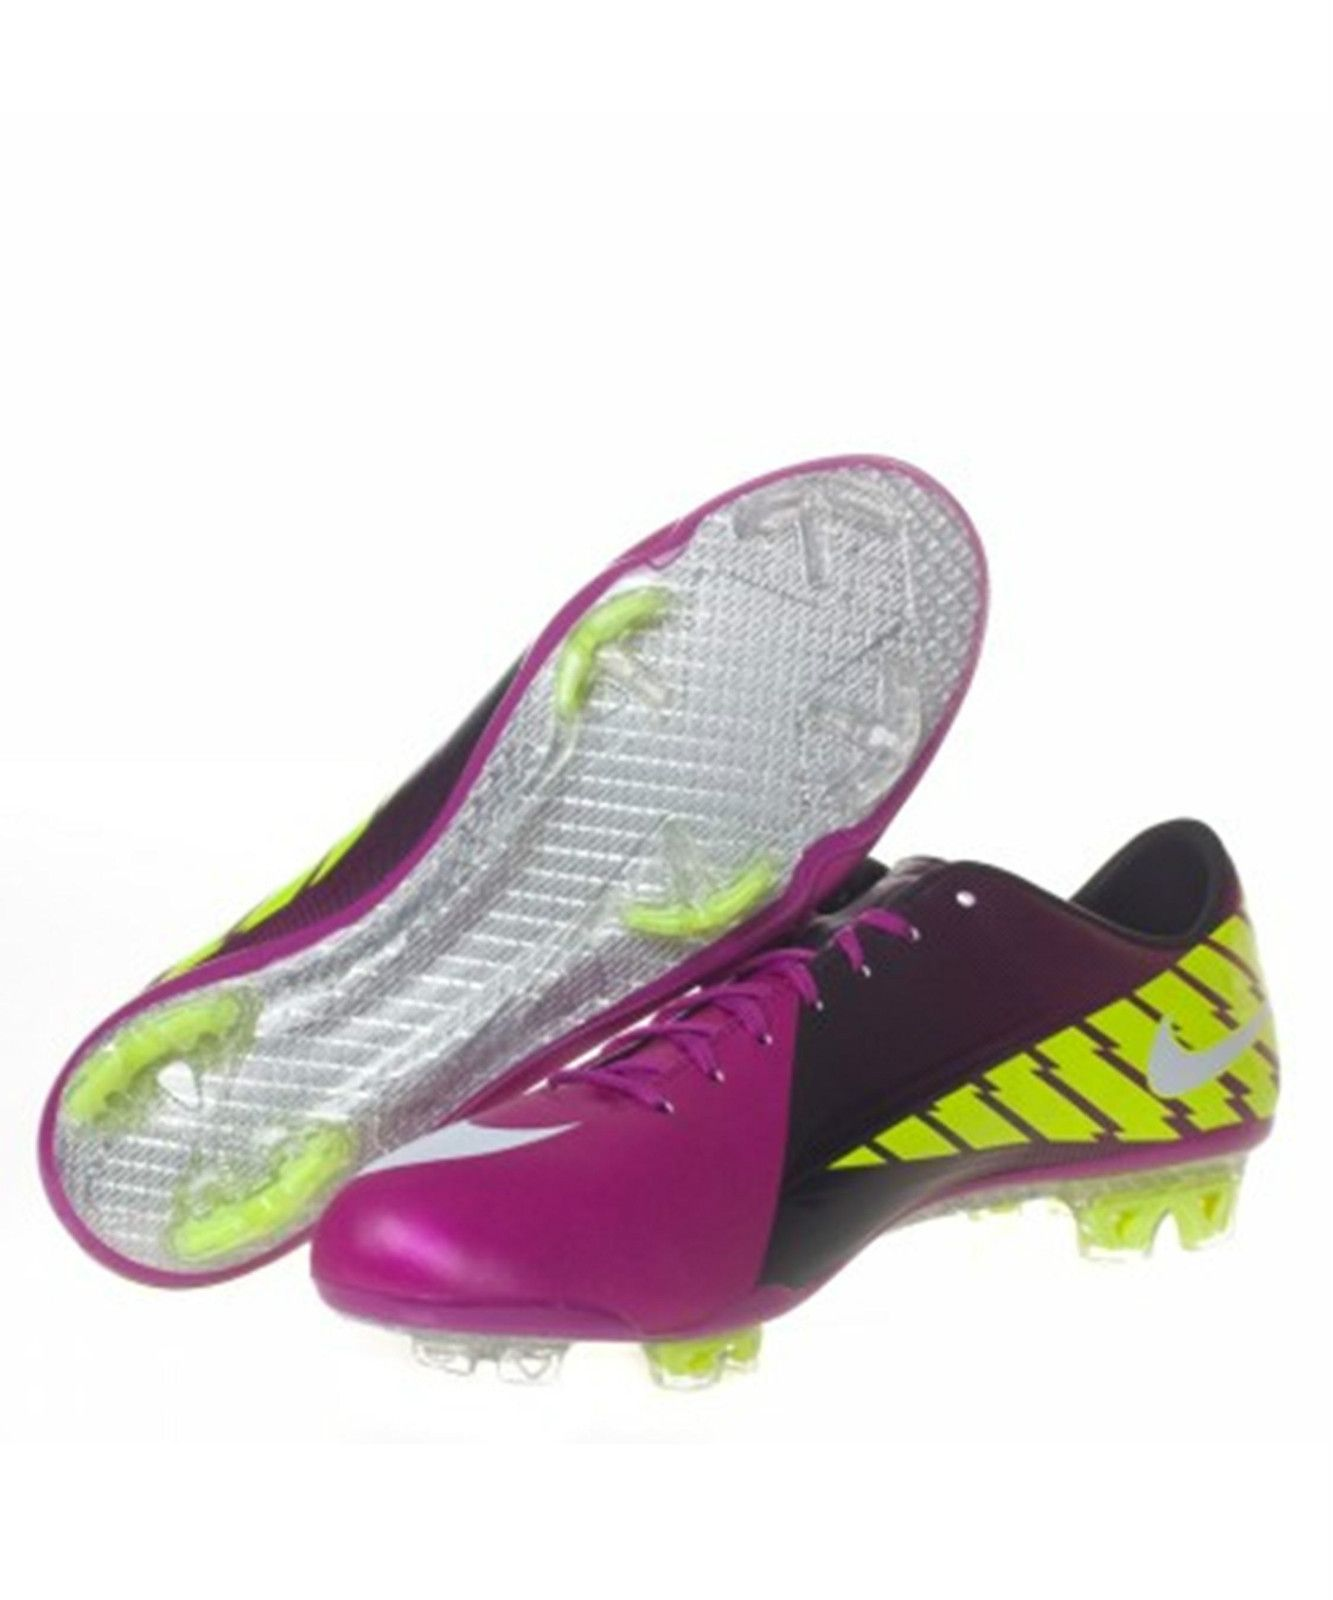 328298b4690 Superfly II football boots from Nike in Windchill Black Chlorine Nike  Mercurial Vapor VII FG - RedPlumWindchill 441976-547Sizes ...